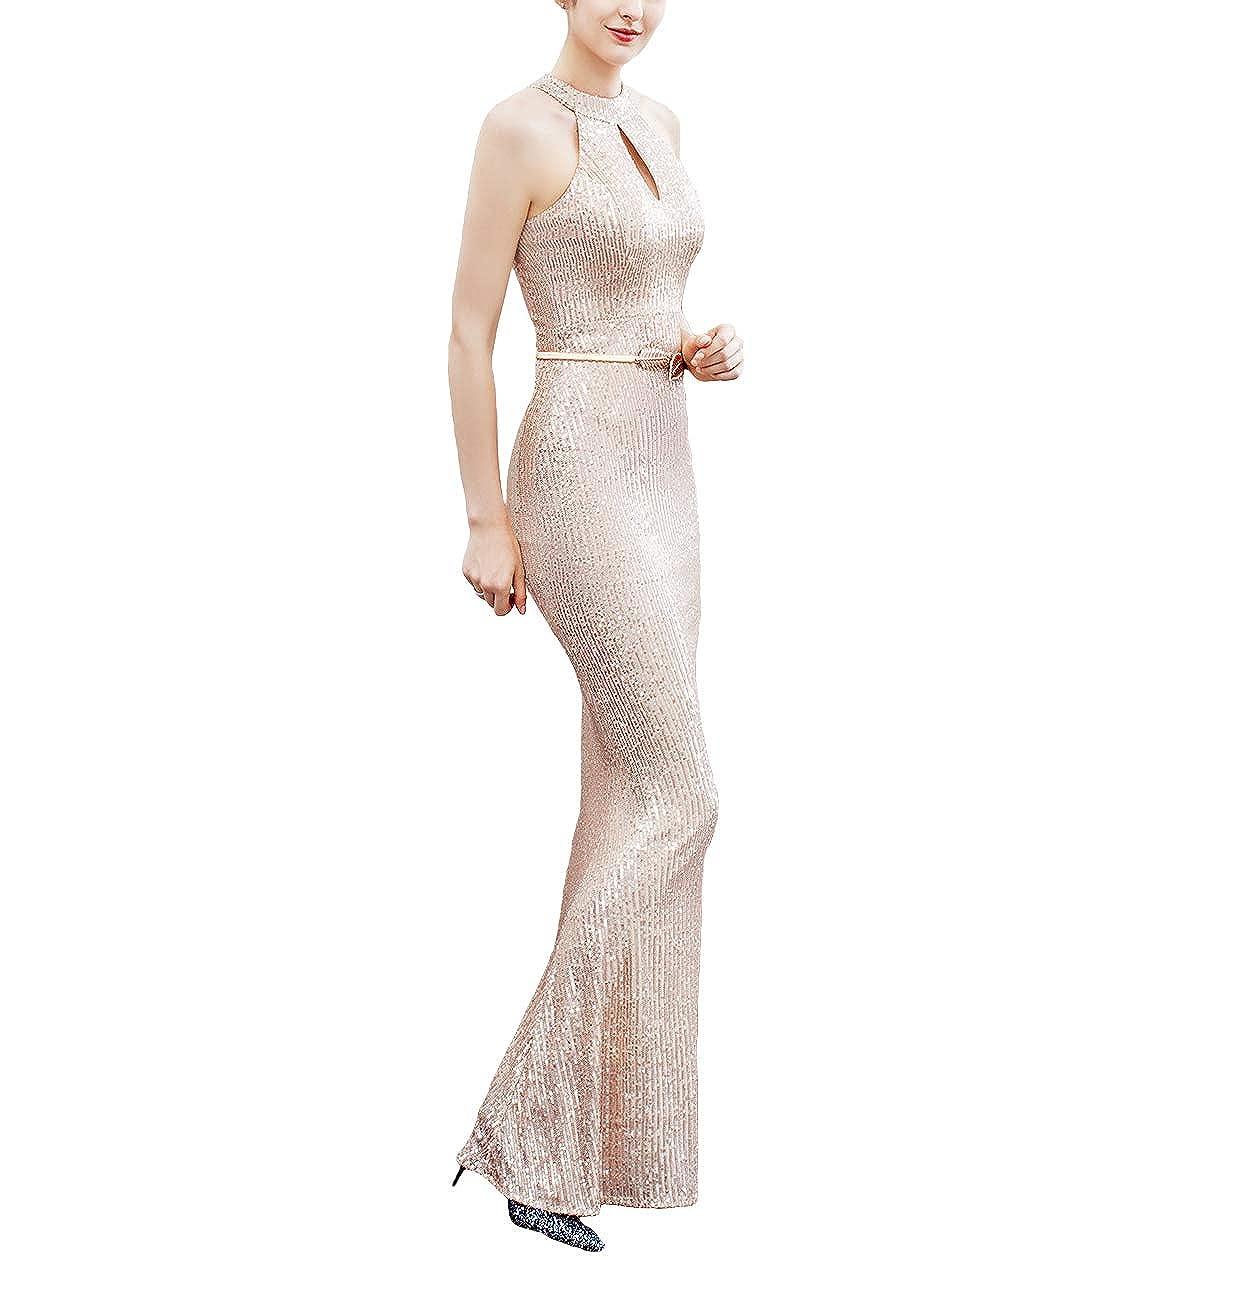 Chowsir Women Elegant Halter Fishtail Slim Cocktail Party Evening Bridesmaid Long Dress